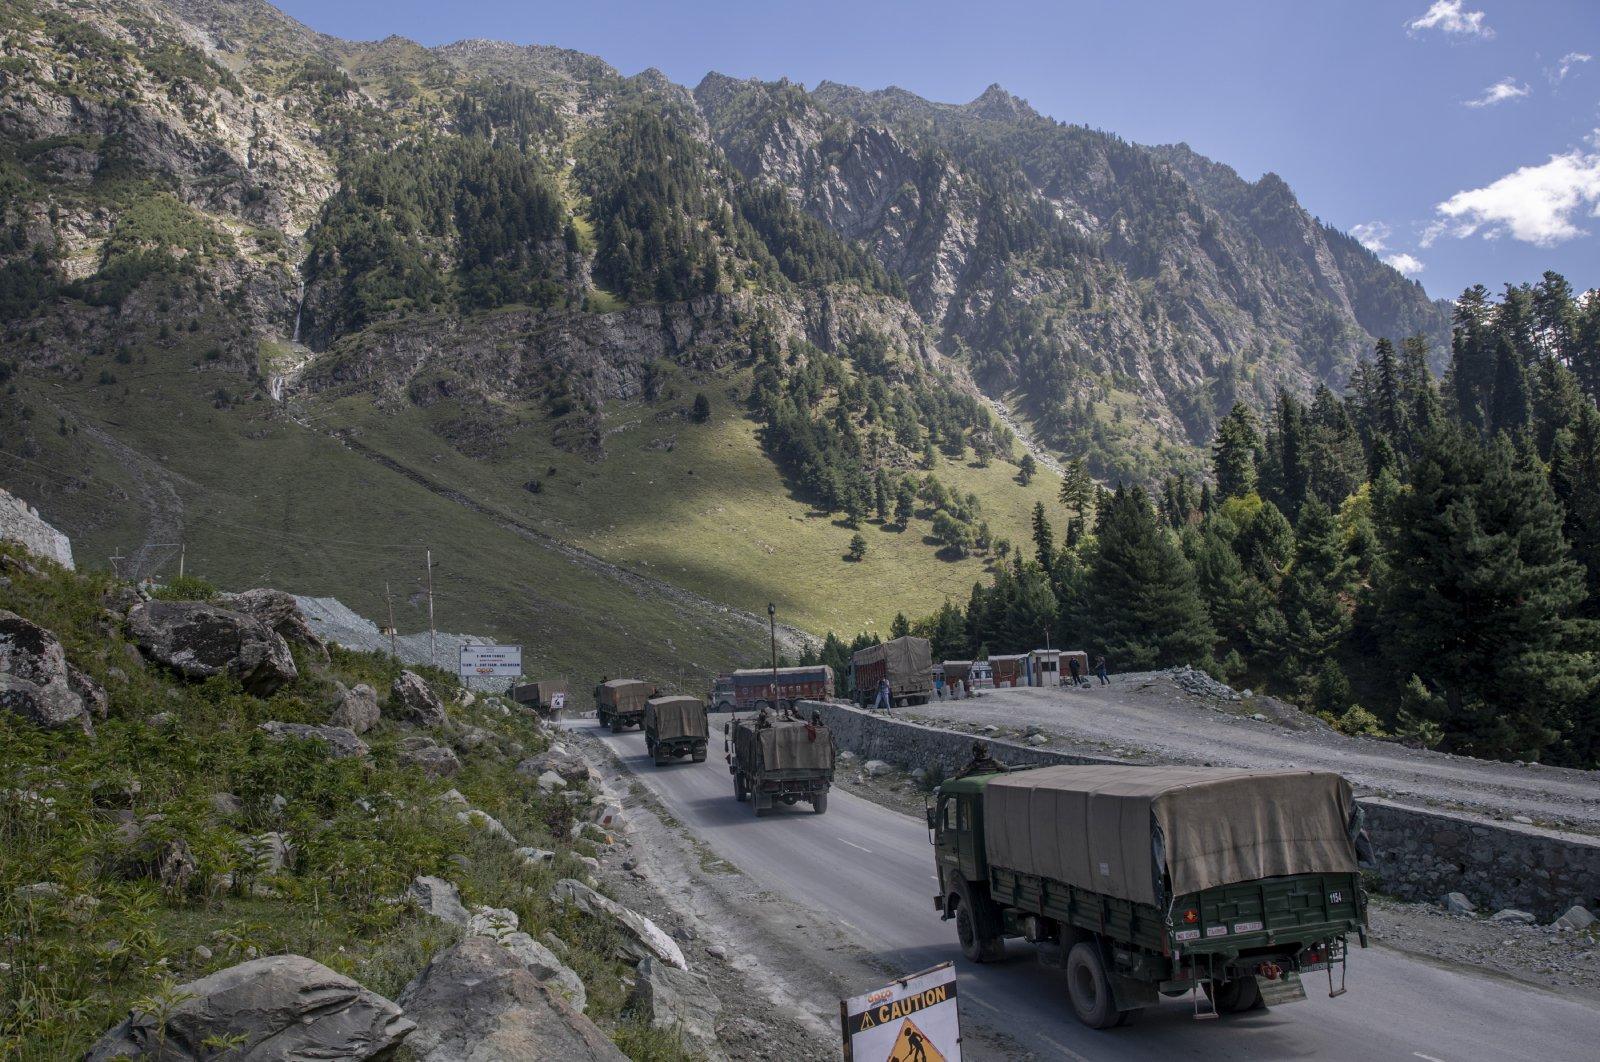 An Indian army convoy moves on the Srinagar-Ladakh highway at Gagangeer, northeast of Srinagar, Indian-controlled Kashmir, Sept. 9, 2020. (AP Photo)